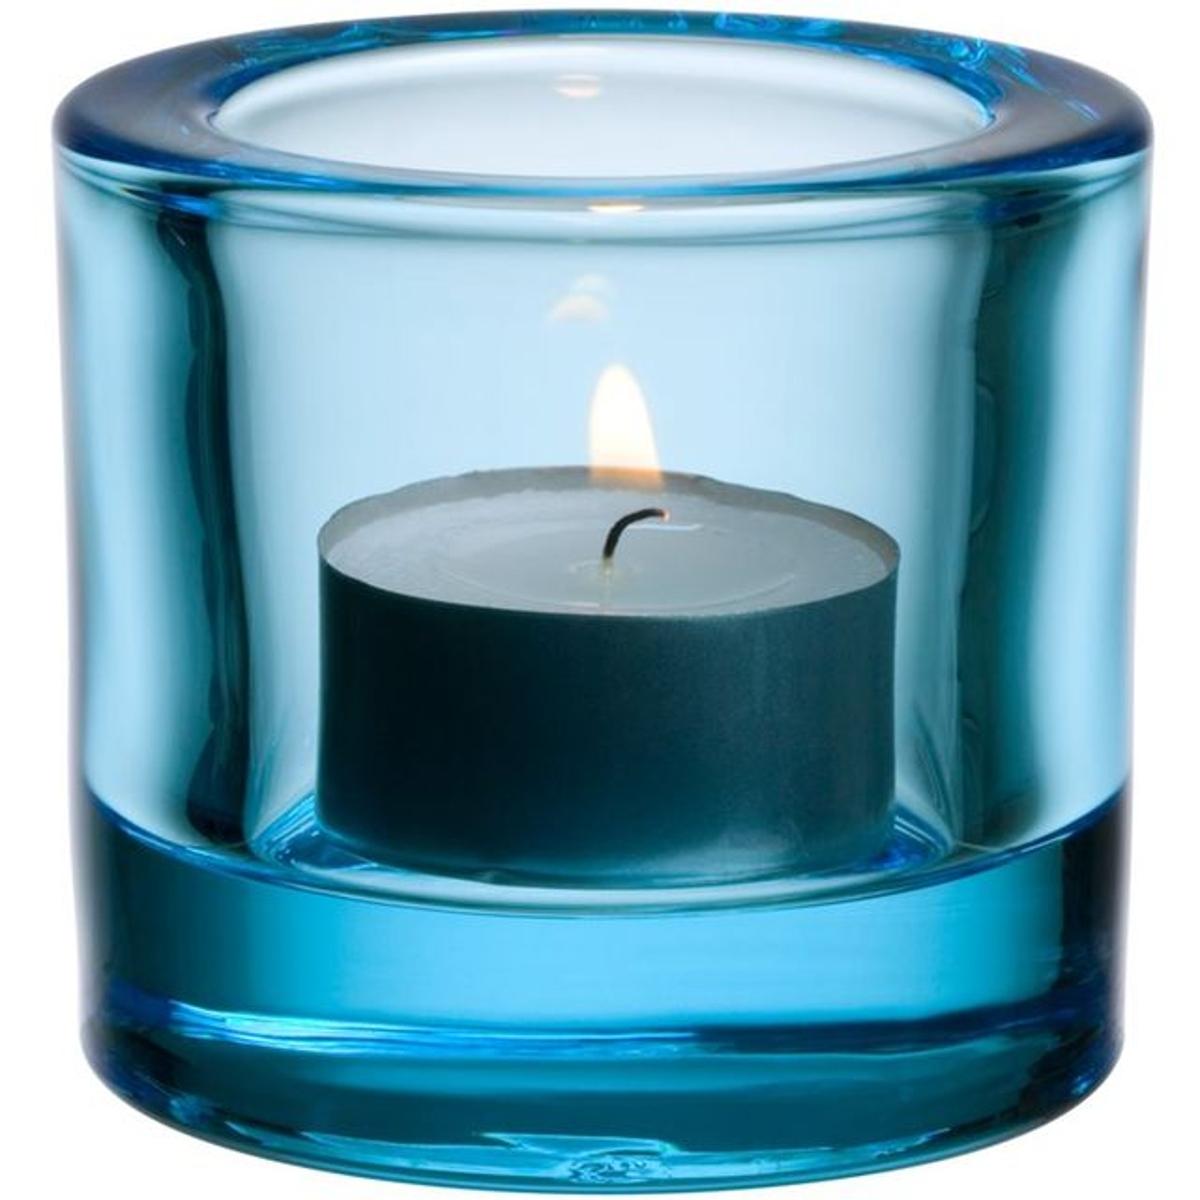 Support à bougie chauffe-plat iittala Kivi- Bleu clair